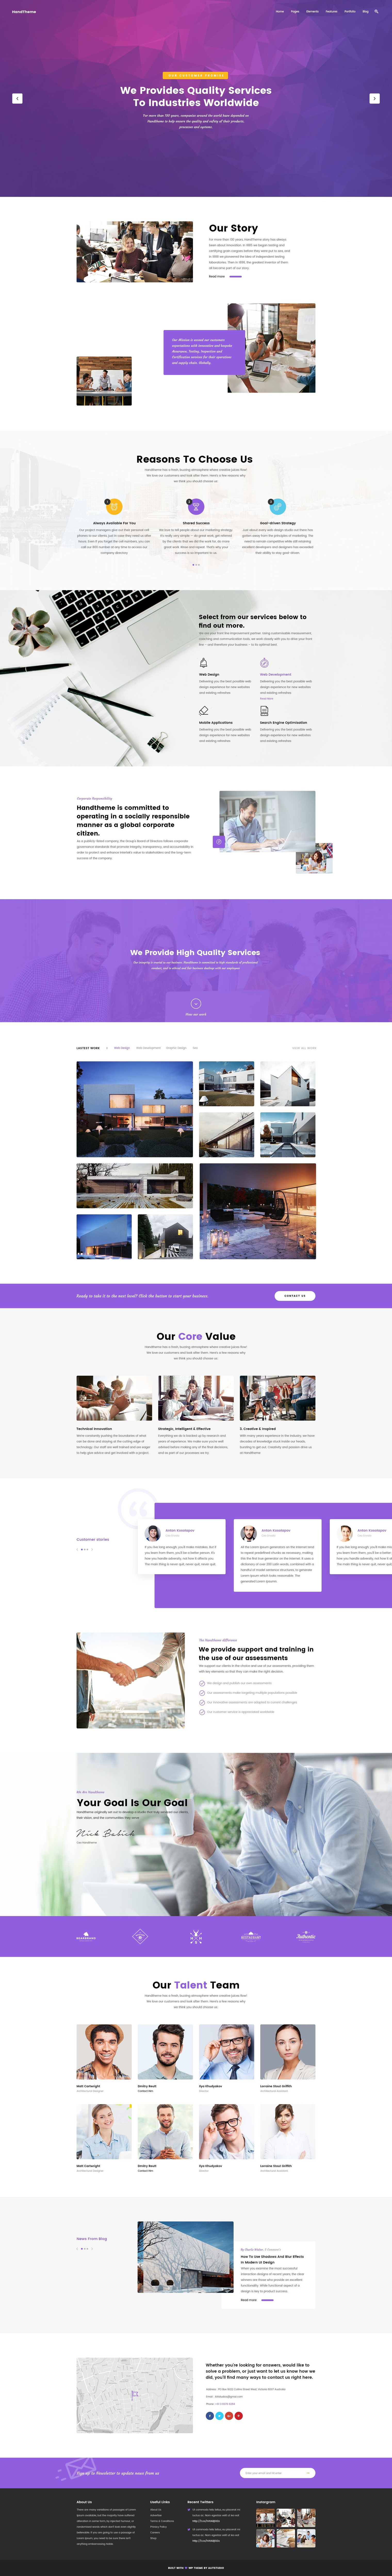 Hand Theme Real Estate   Portfolio   Multi-Purpose Template #photoshop #property psd template #psd • Download ➝ https://themeforest.net/item/handtheme-real-estate-template-multipurpose/19562490?ref=pxcr